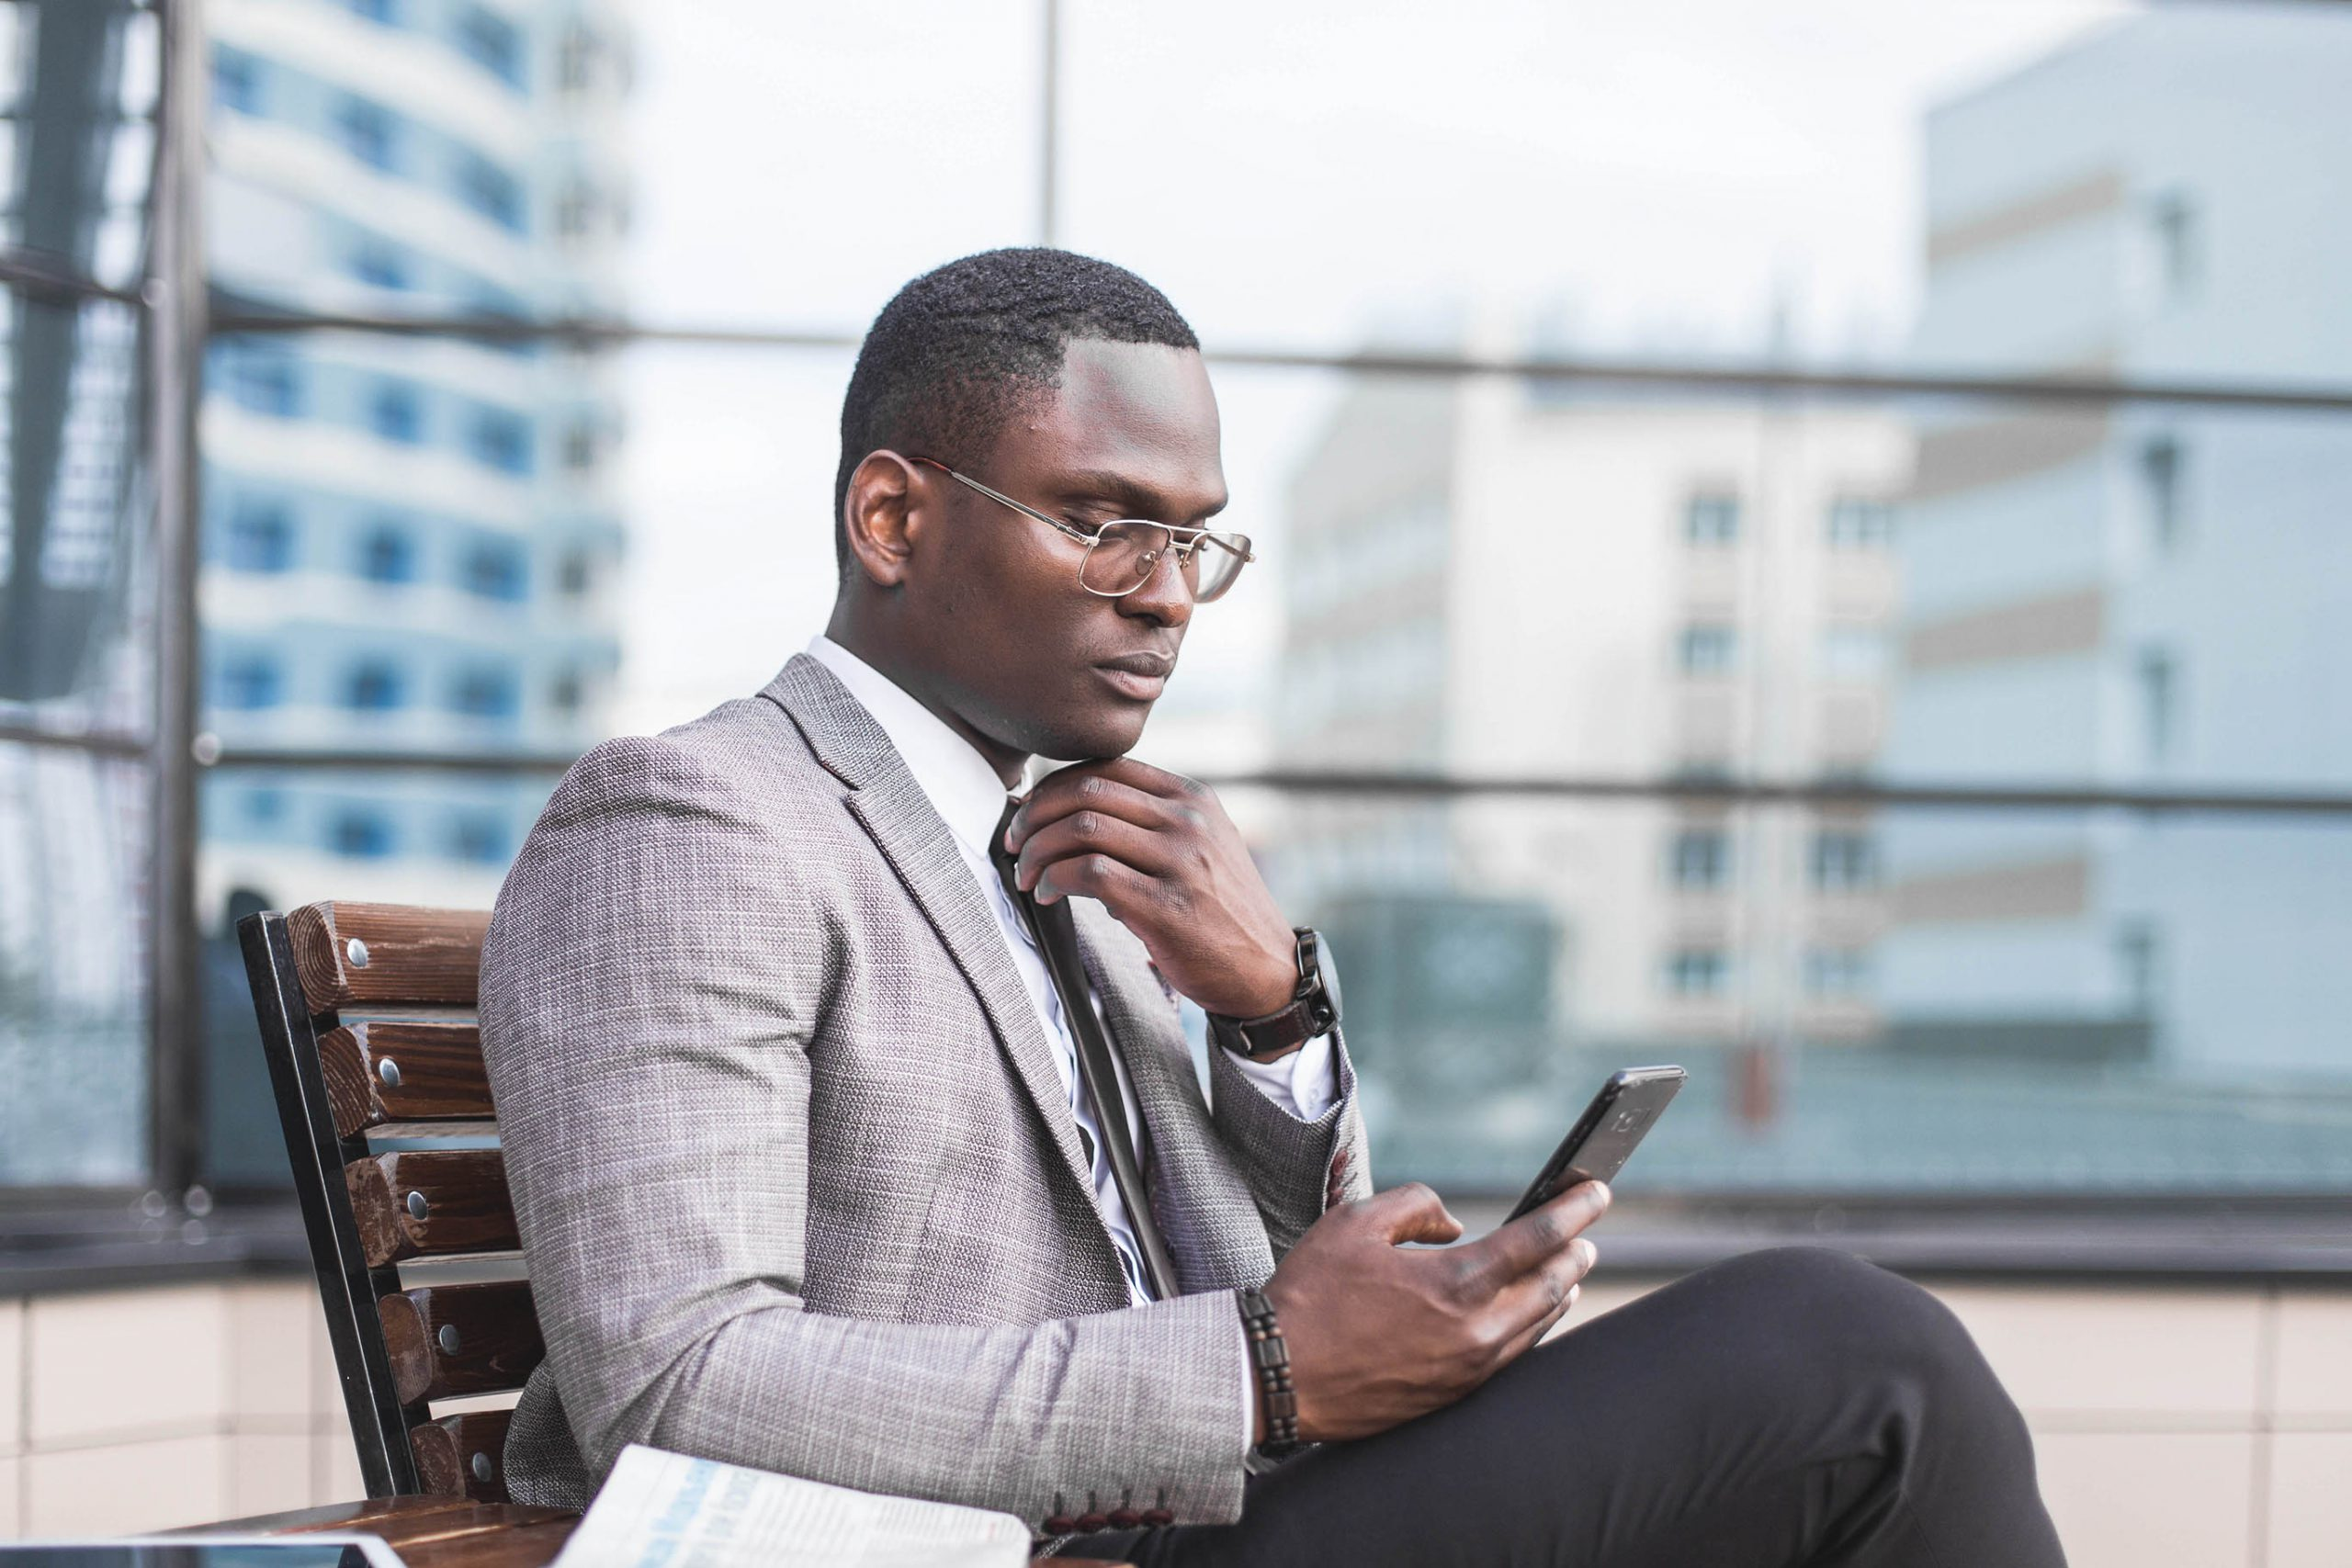 Salesmaker Using Sales Enablement Technology